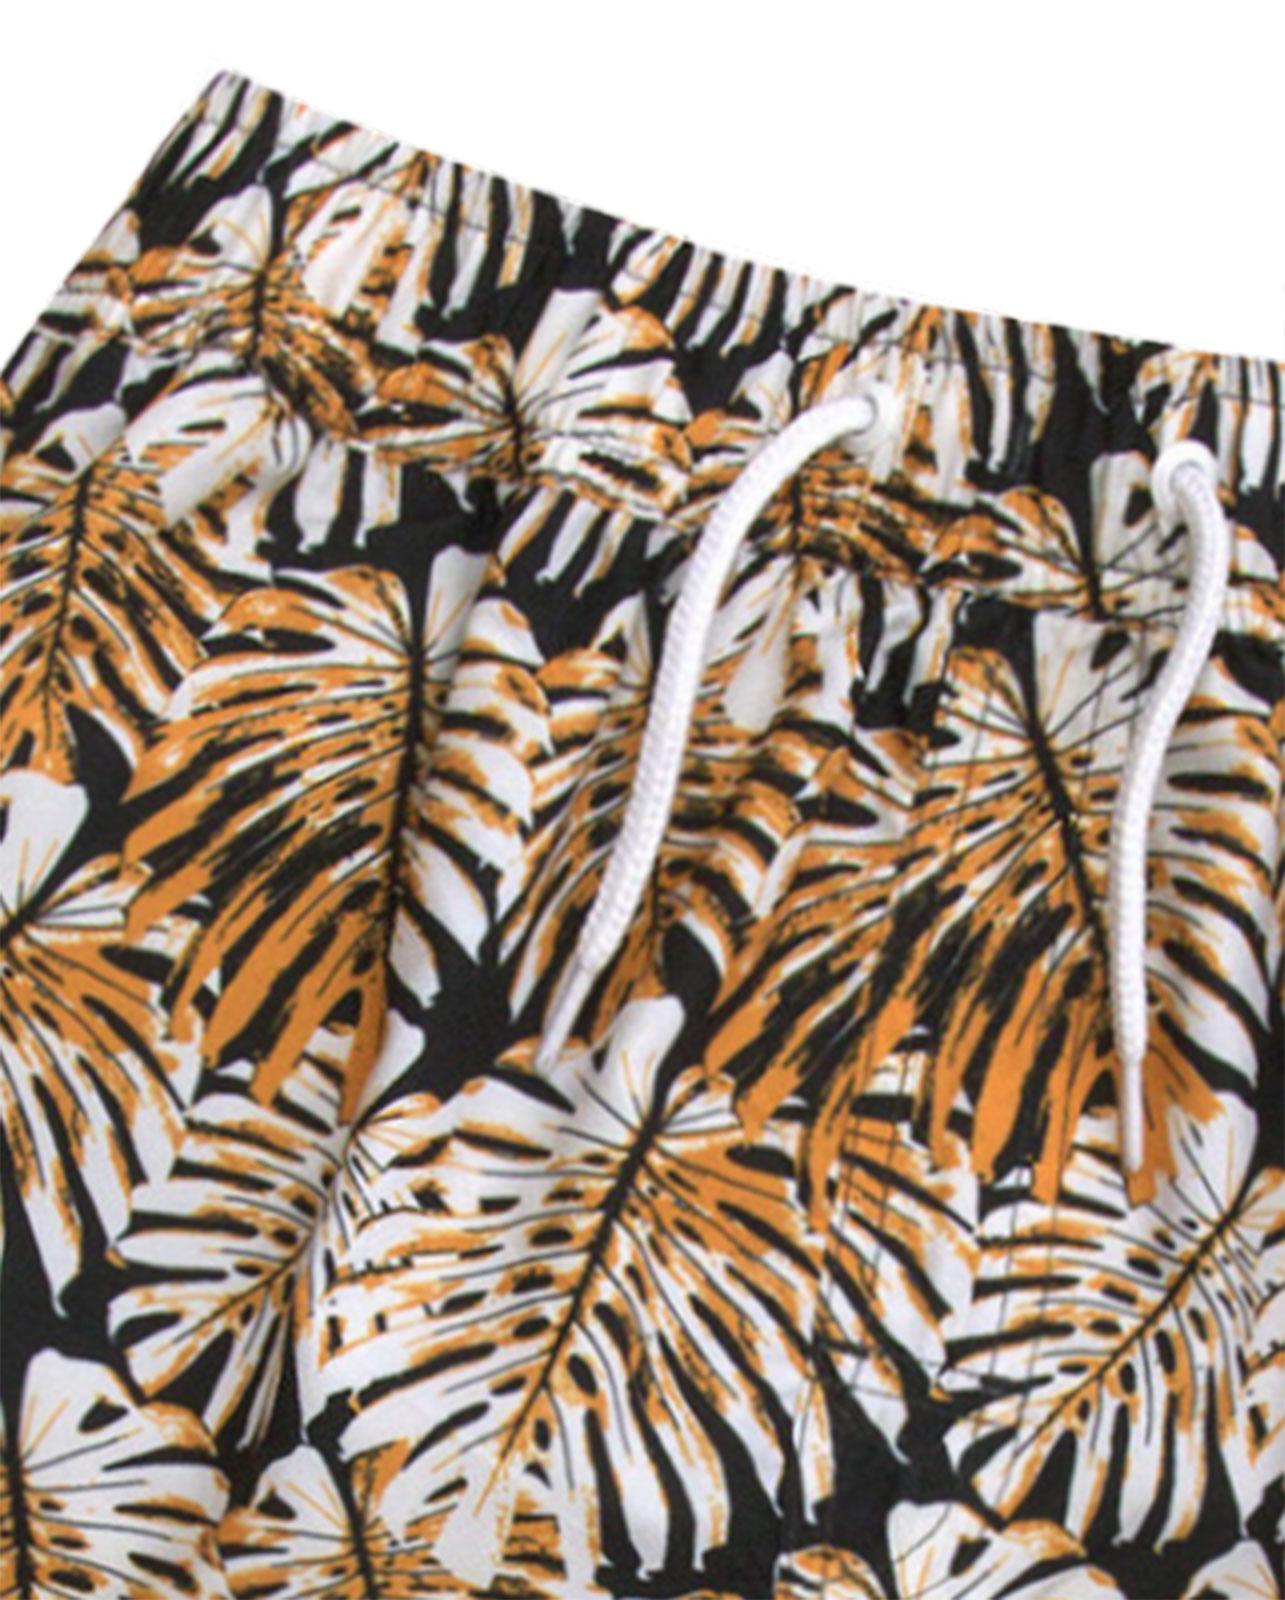 Boys-Swimming-Shorts-Kids-Bermuda-Holiday-Trunks-2-3-4-5-6-7-8-9-10-11-12-13-Yrs thumbnail 7